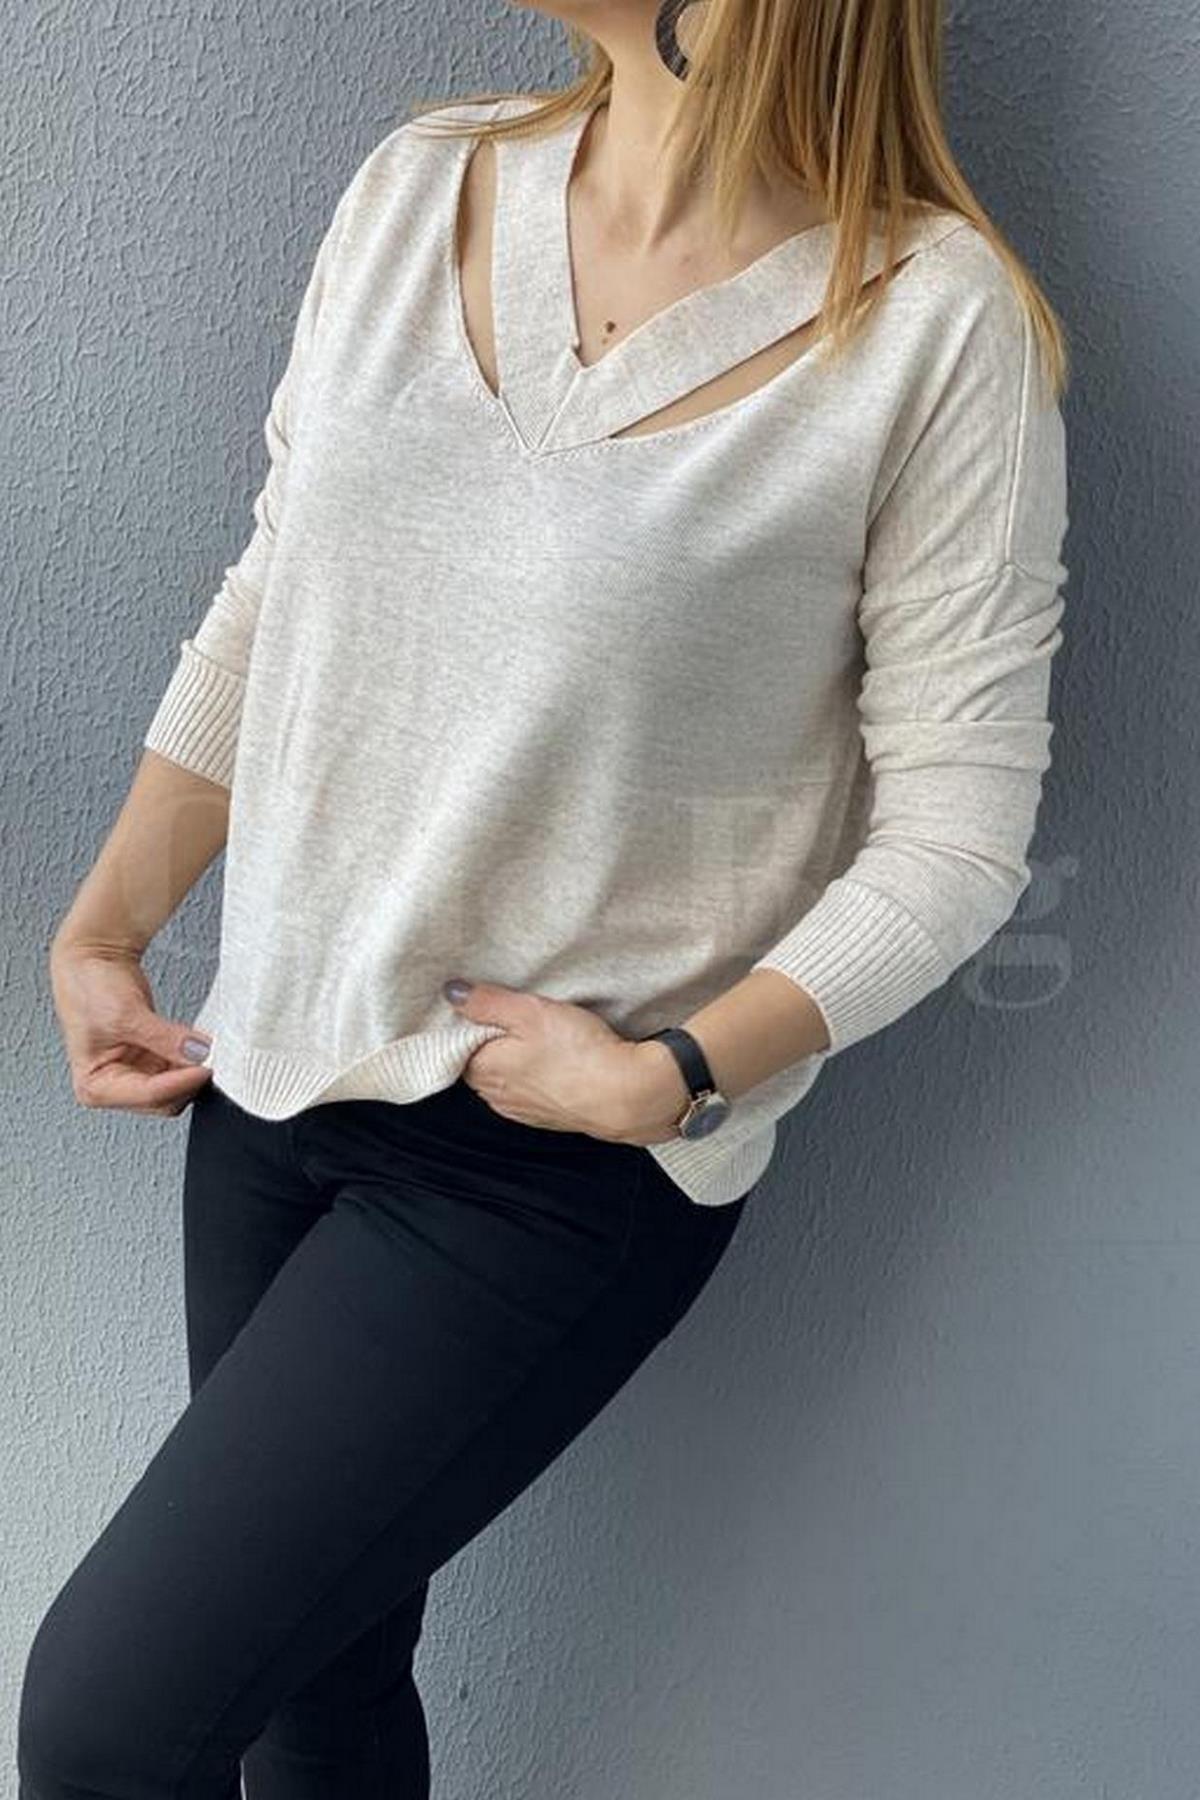 https://resim.chicbag.com.tr/chb11270110/kre/fashion-v-yaka-yaka-kenari-yirtmacli-triko-chb-0001154be-01ab104f8a8c.